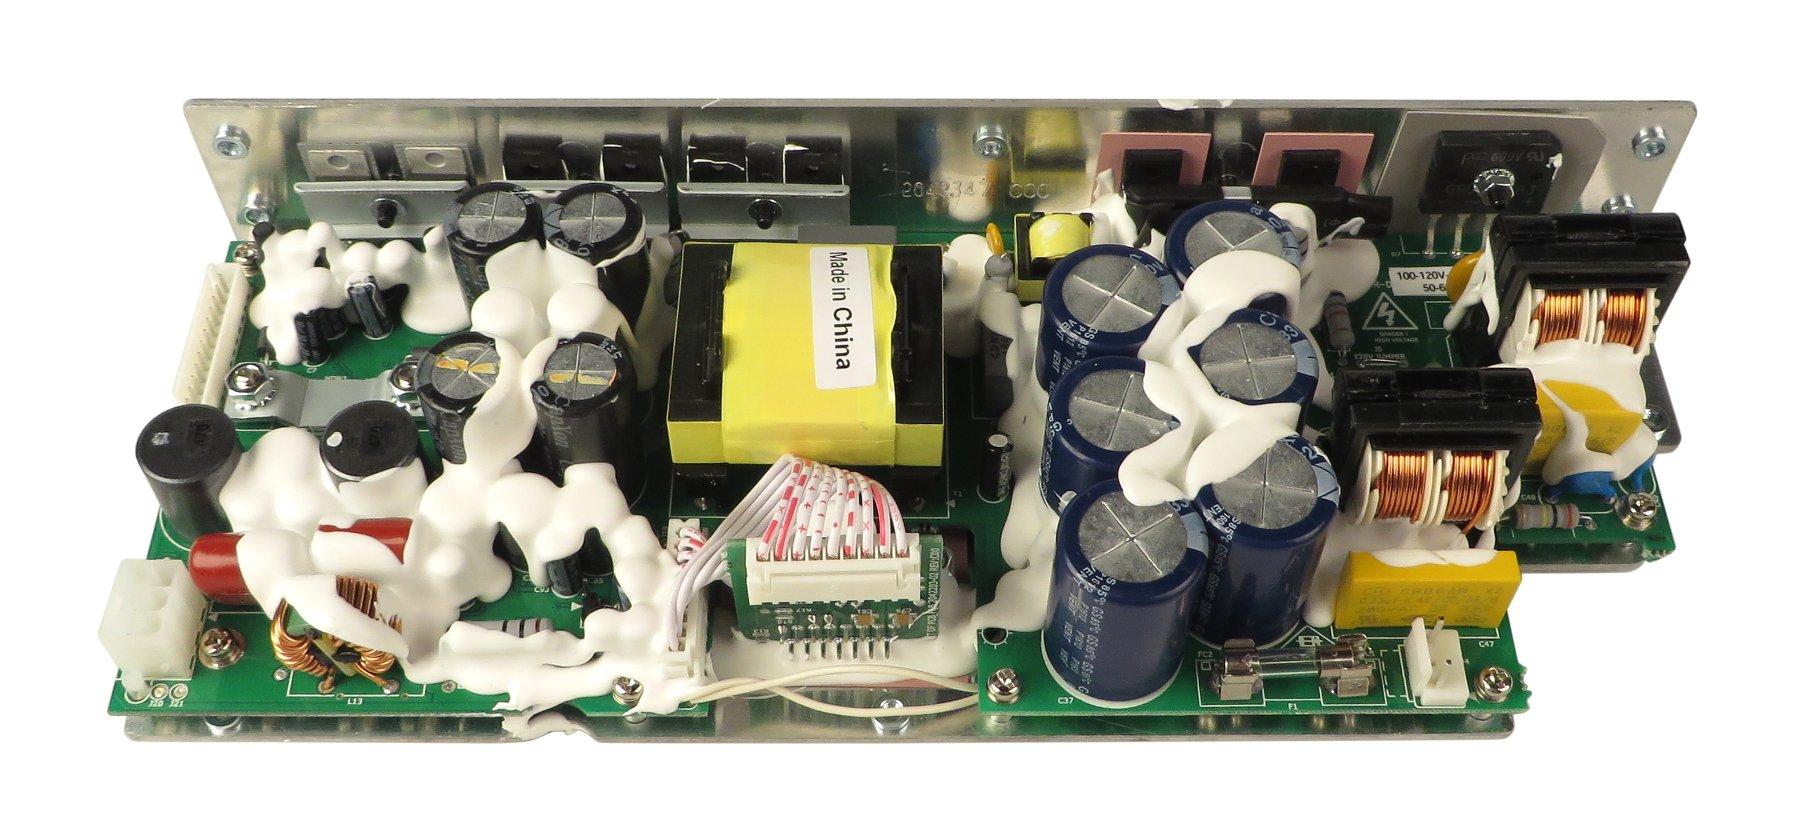 Mackie 2042348-03 Amp/Power Supply PCB for SRM450V3 2042348-03